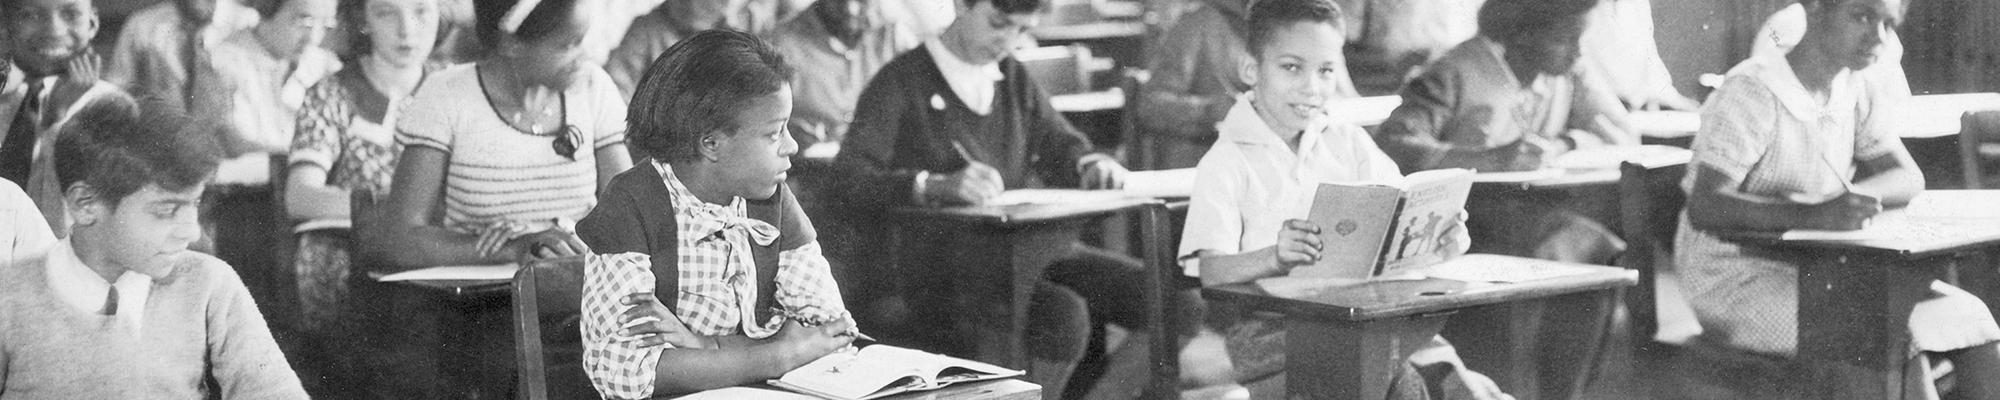 Students sitting at their desks doing work. Circa 1940-1950.